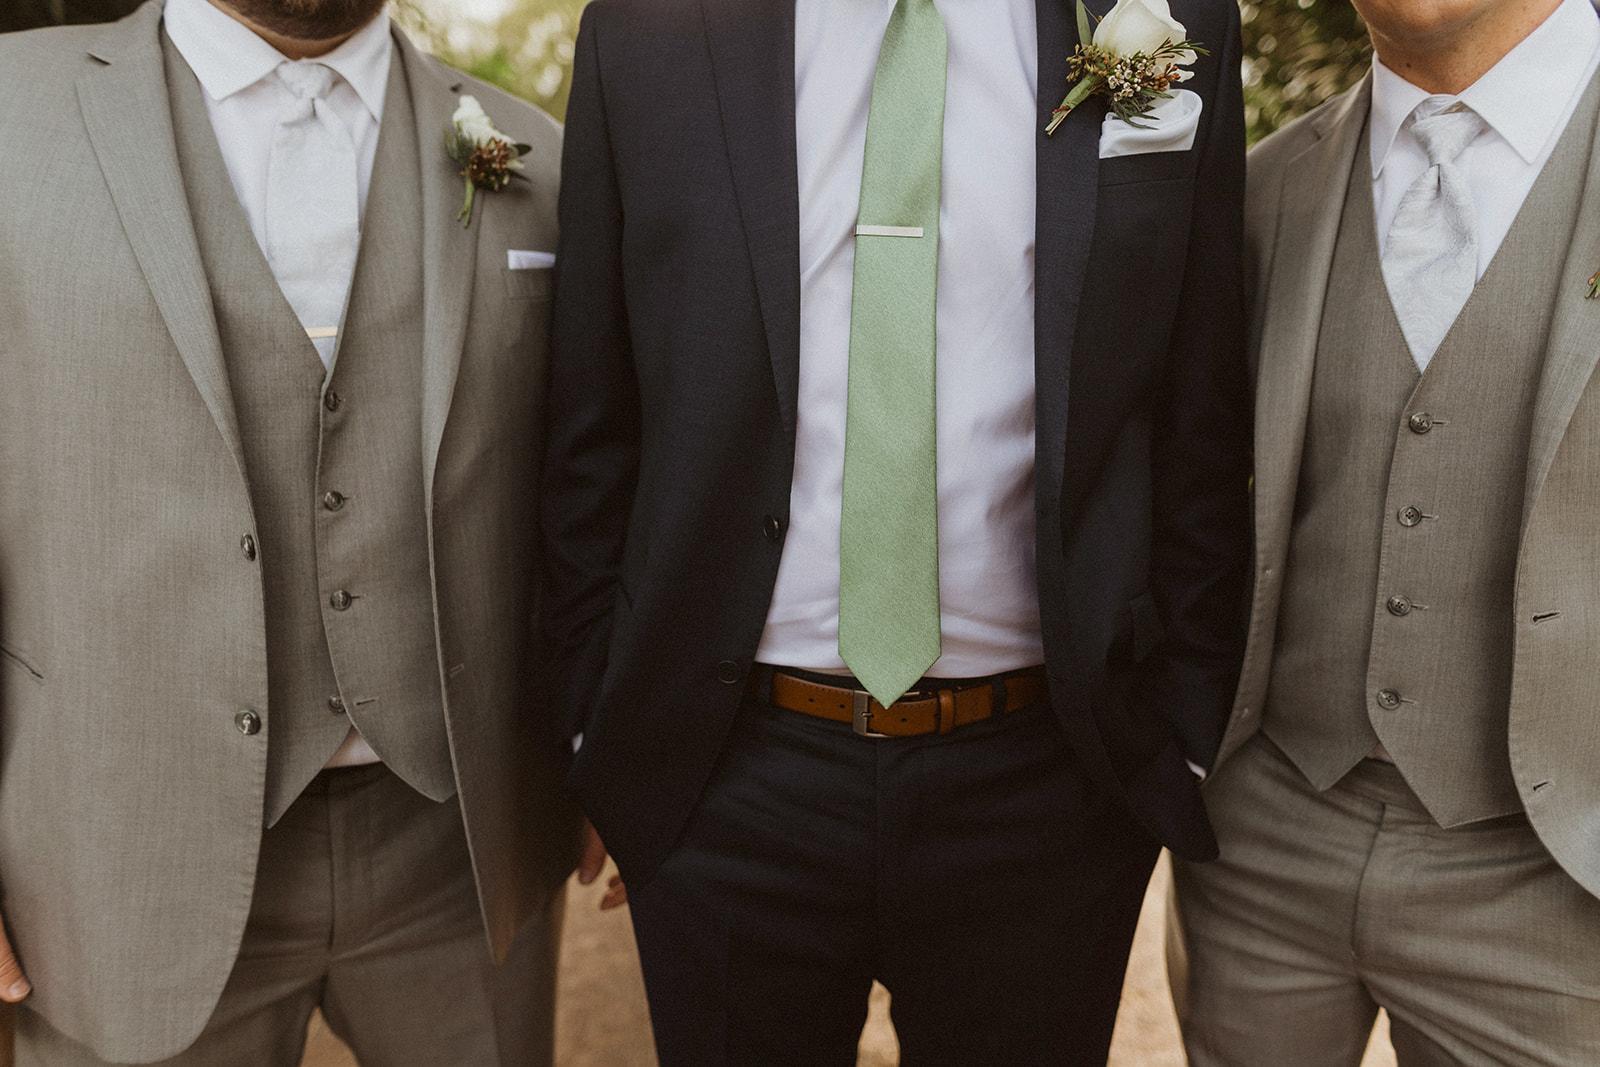 groom_suit_details.jpeg